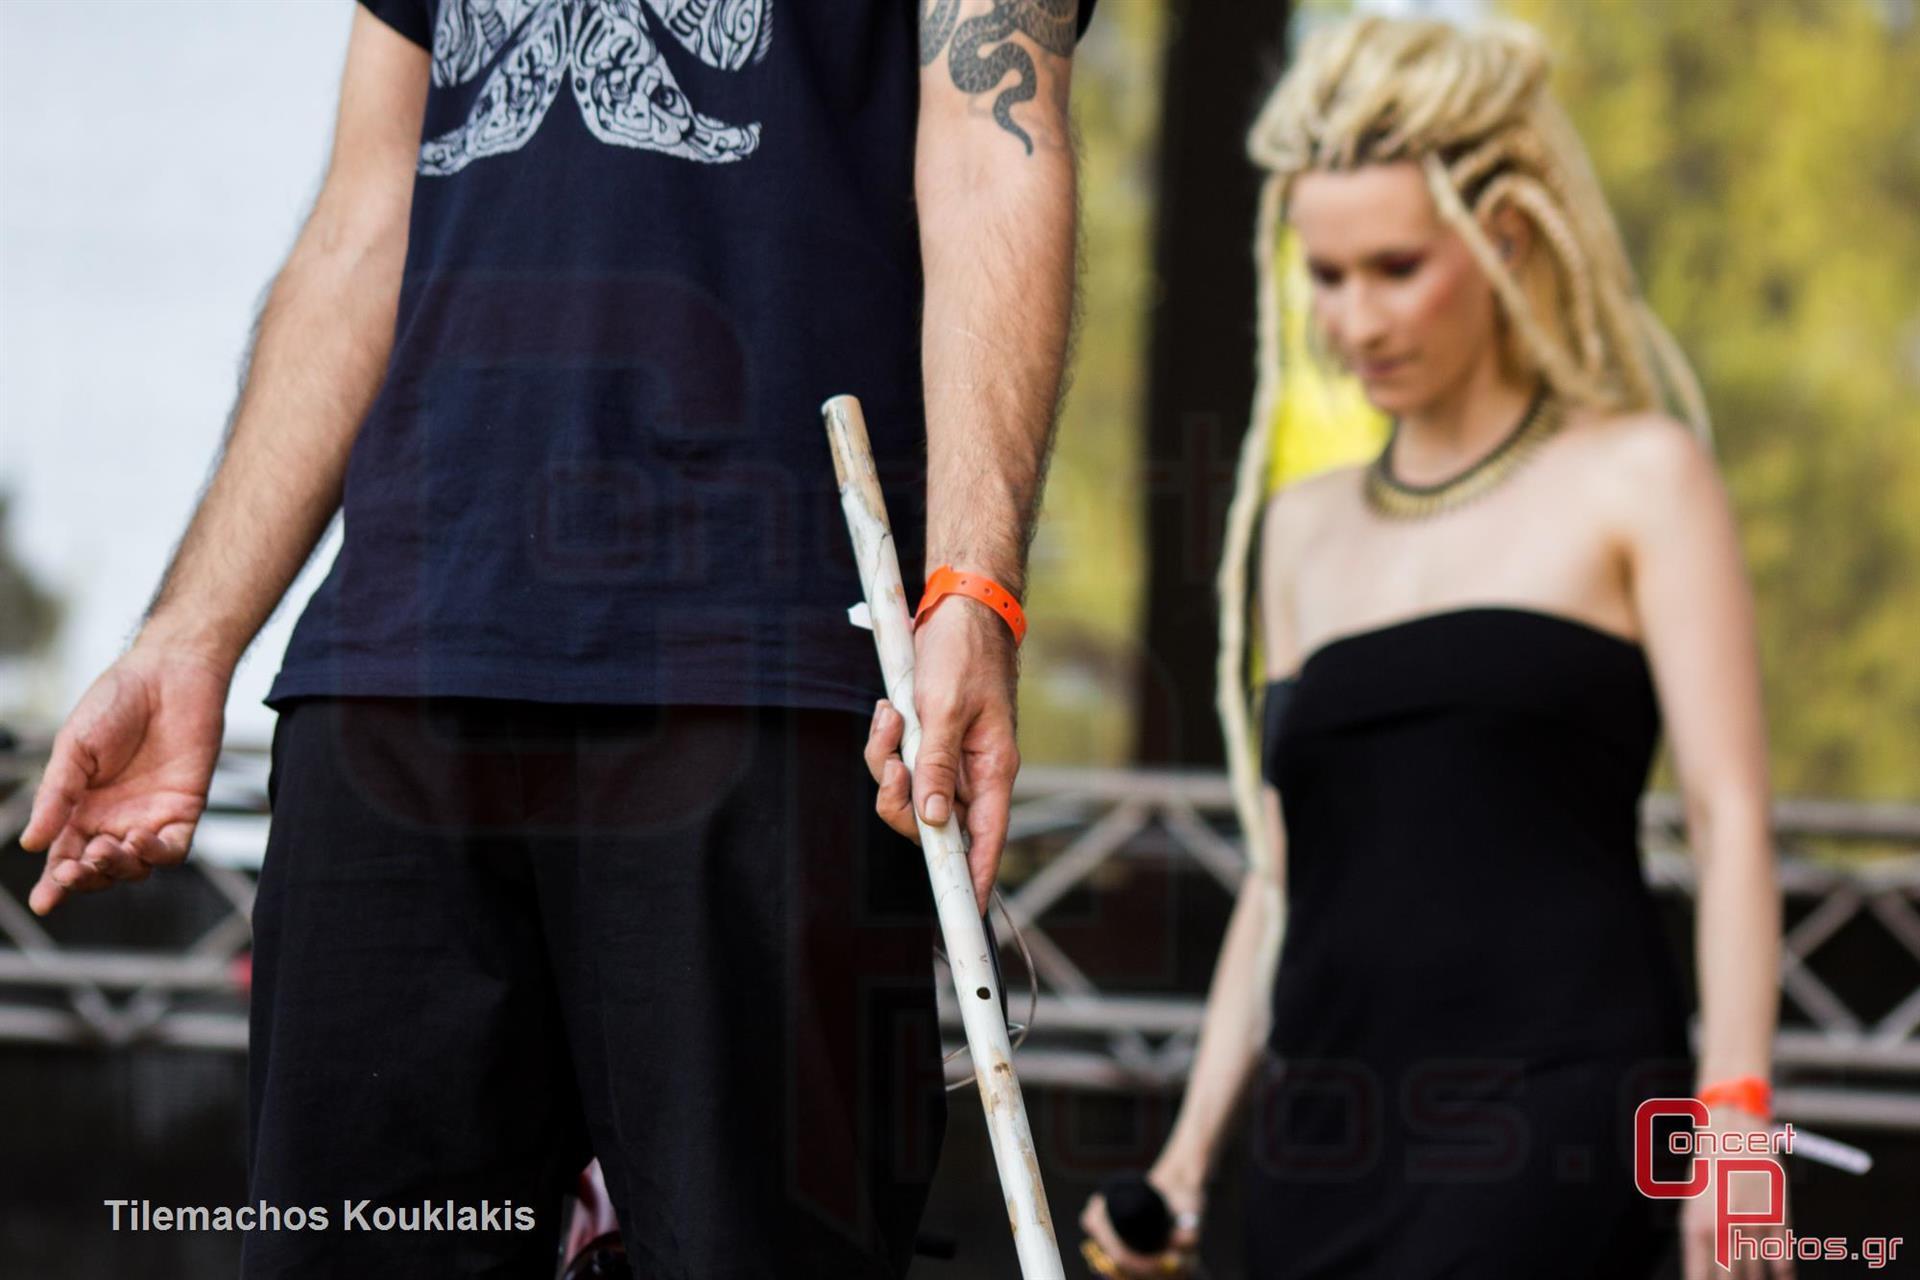 Chaostar-Chaostar photographer: Tilemachos Kouklakis - concertphotos_-0195